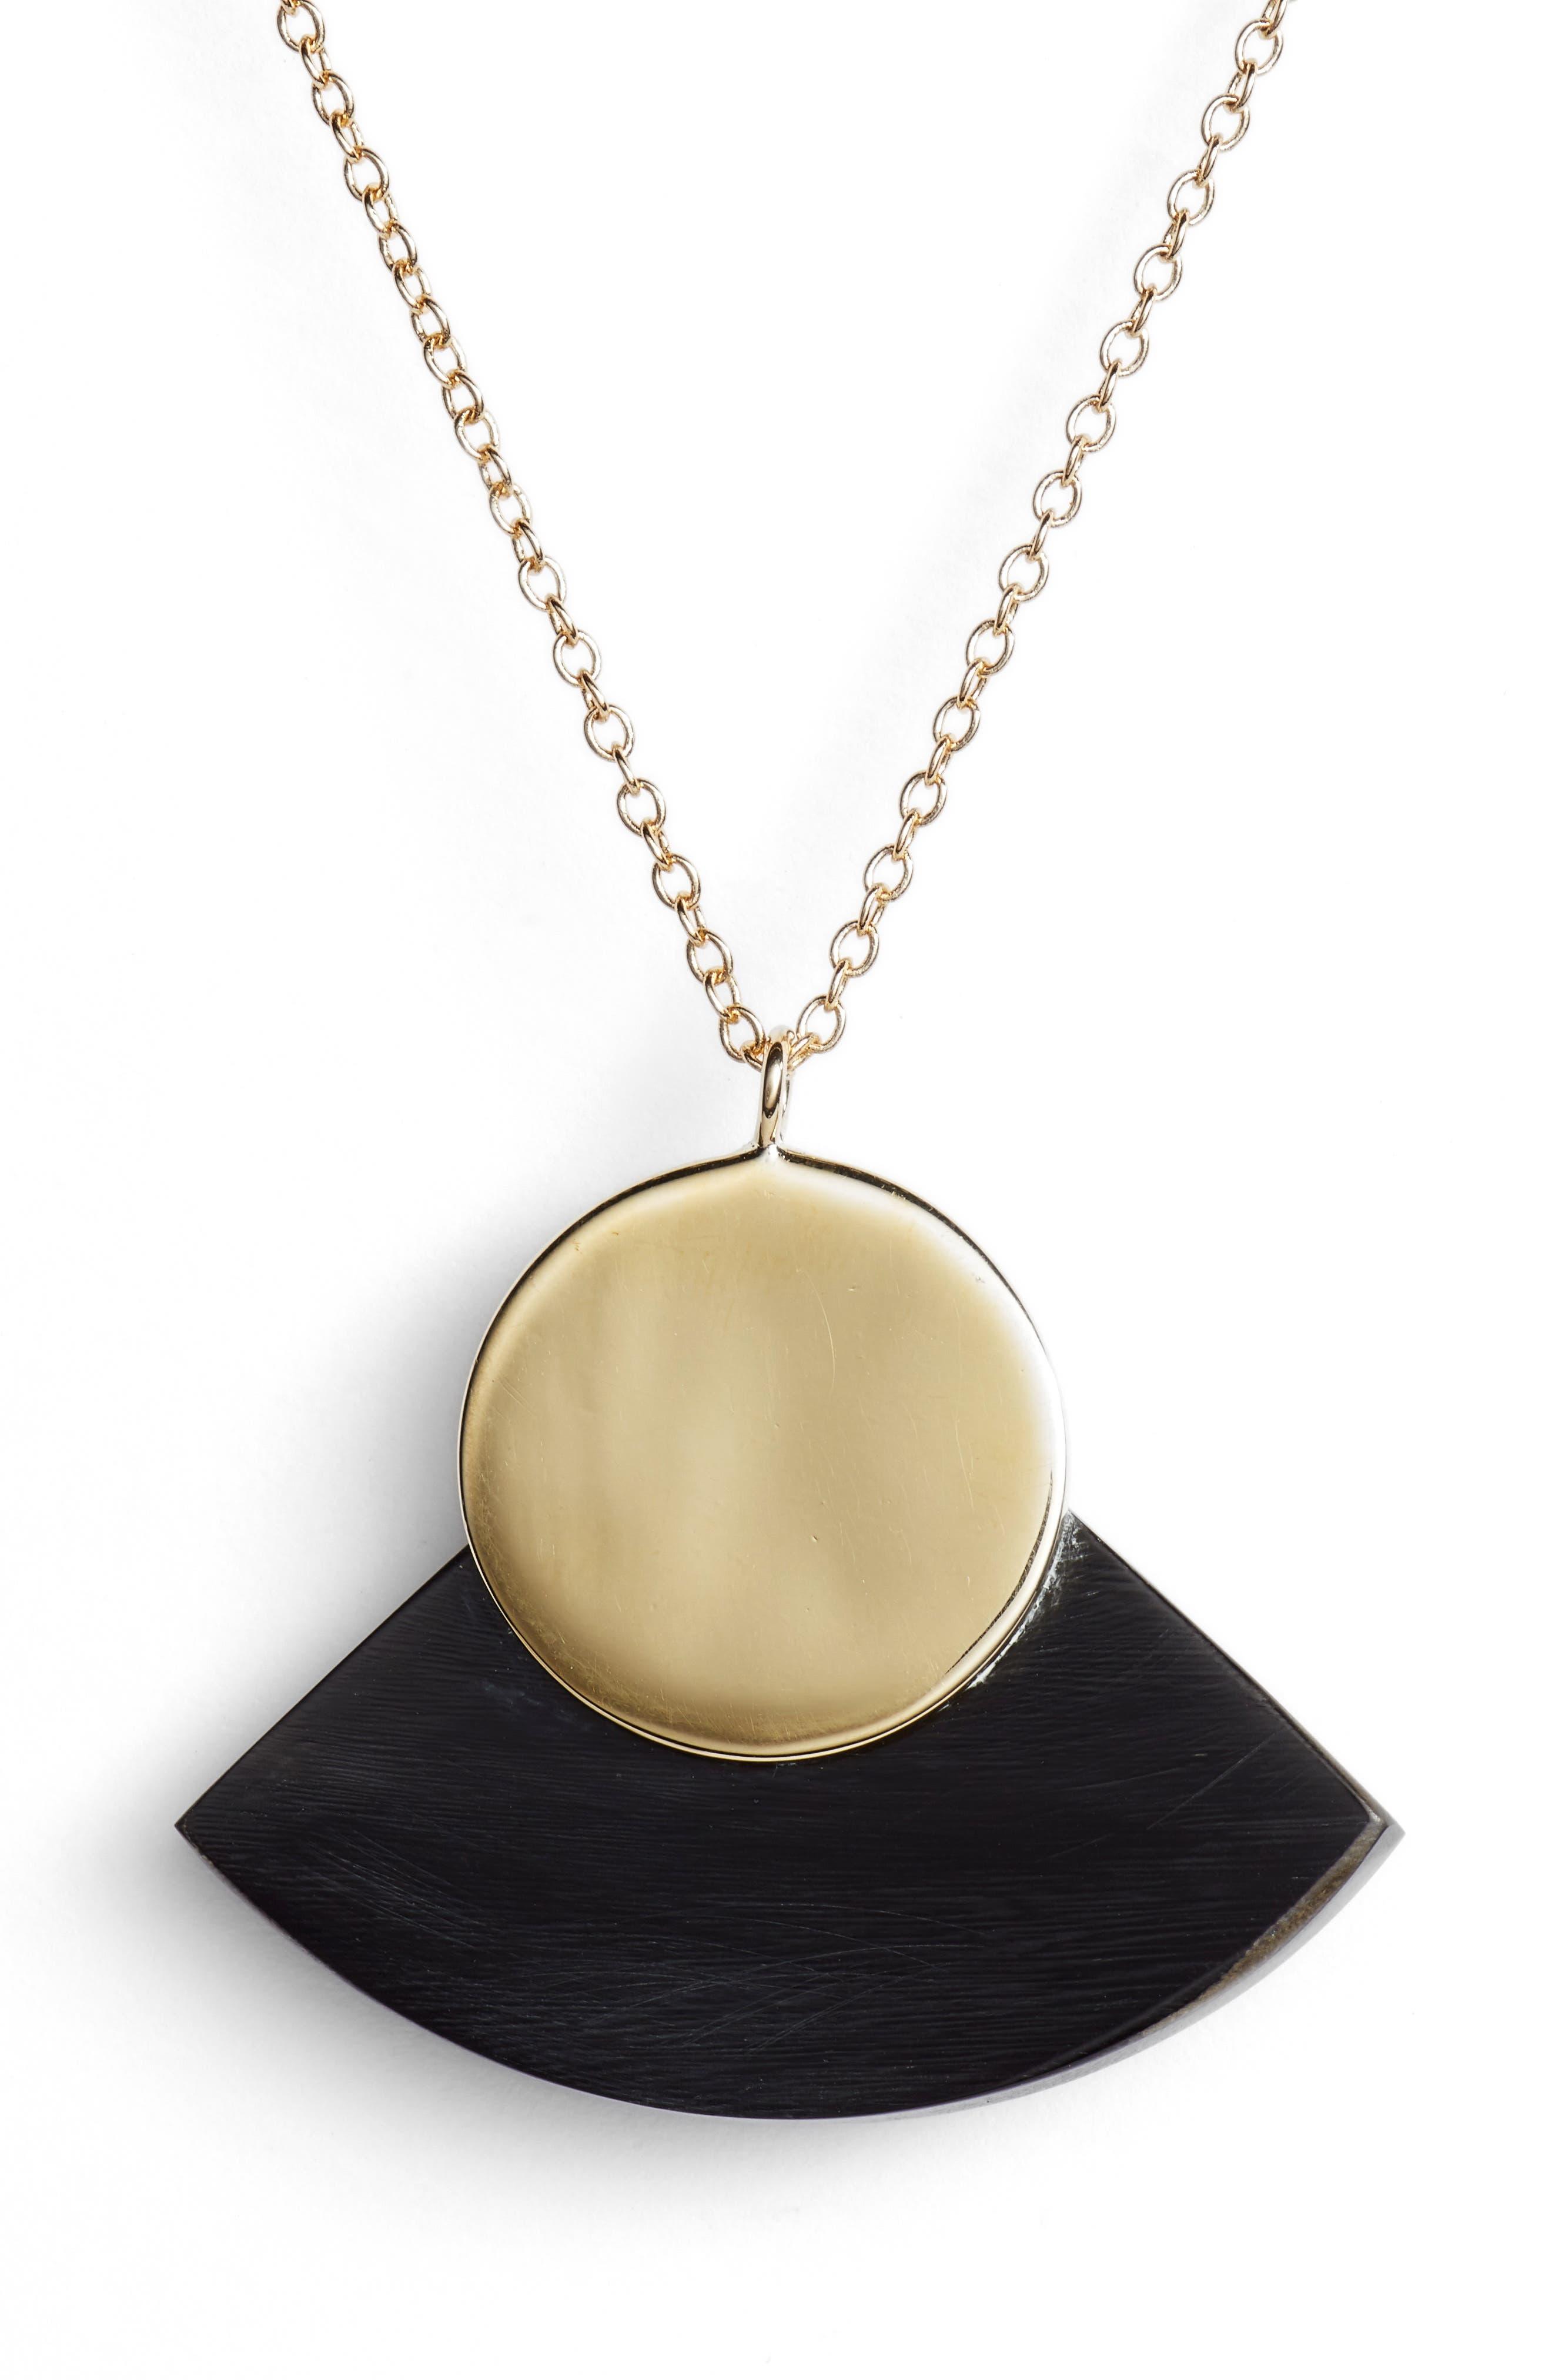 Horn Paddle Pendant Necklace,                             Alternate thumbnail 2, color,                             Black/ Brass